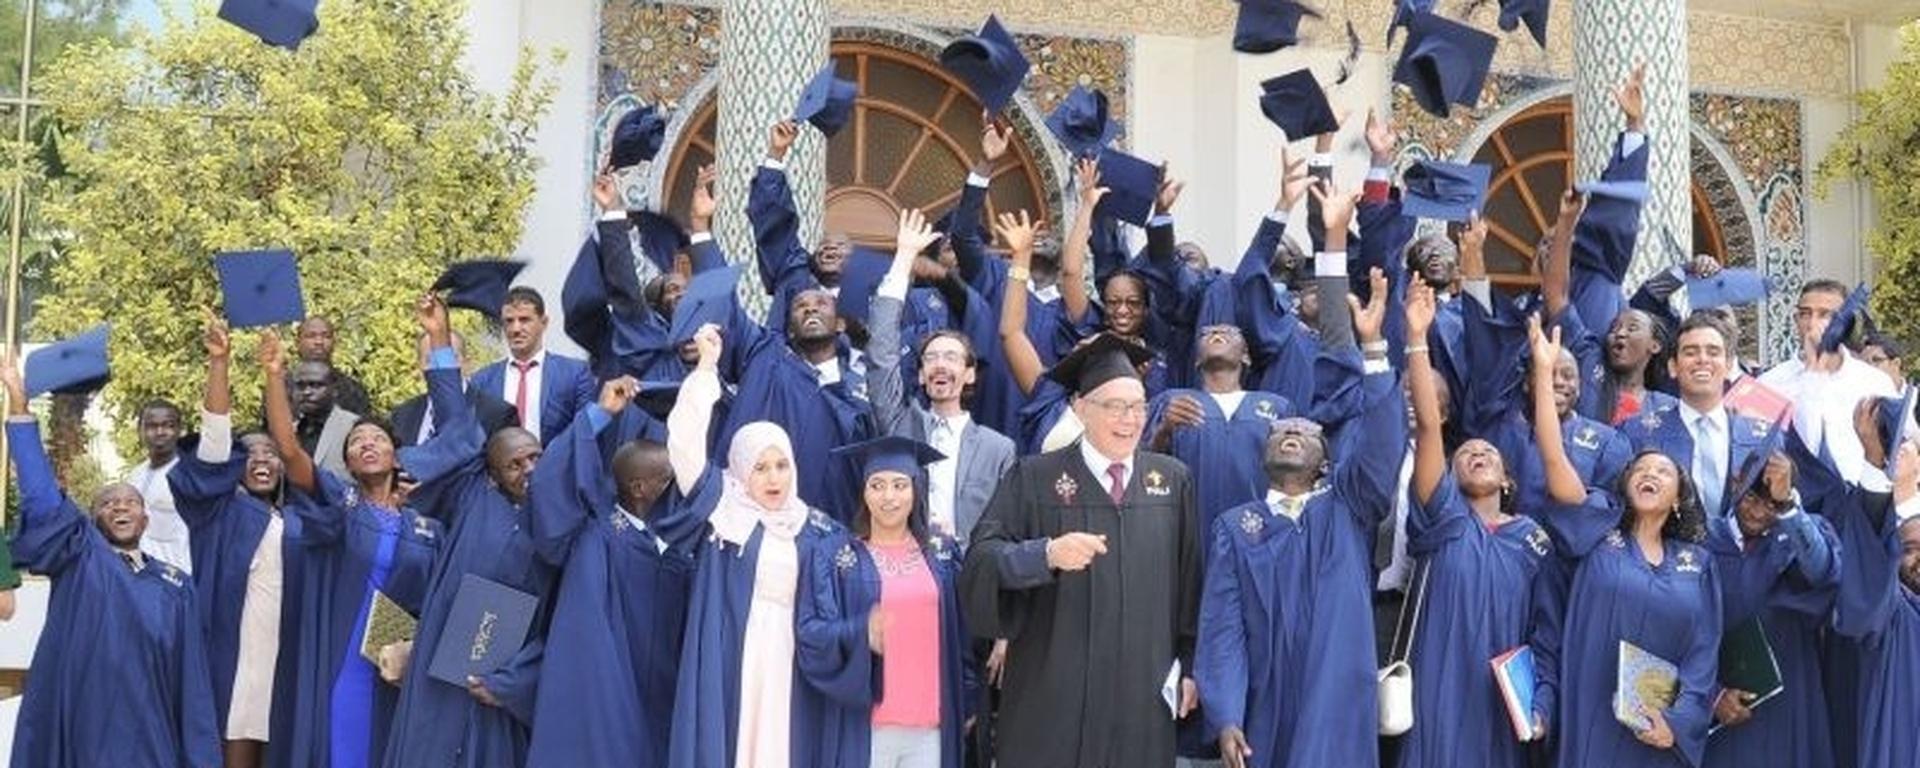 East African Community - East African Community Scholarships Movemeback African initiative cover image